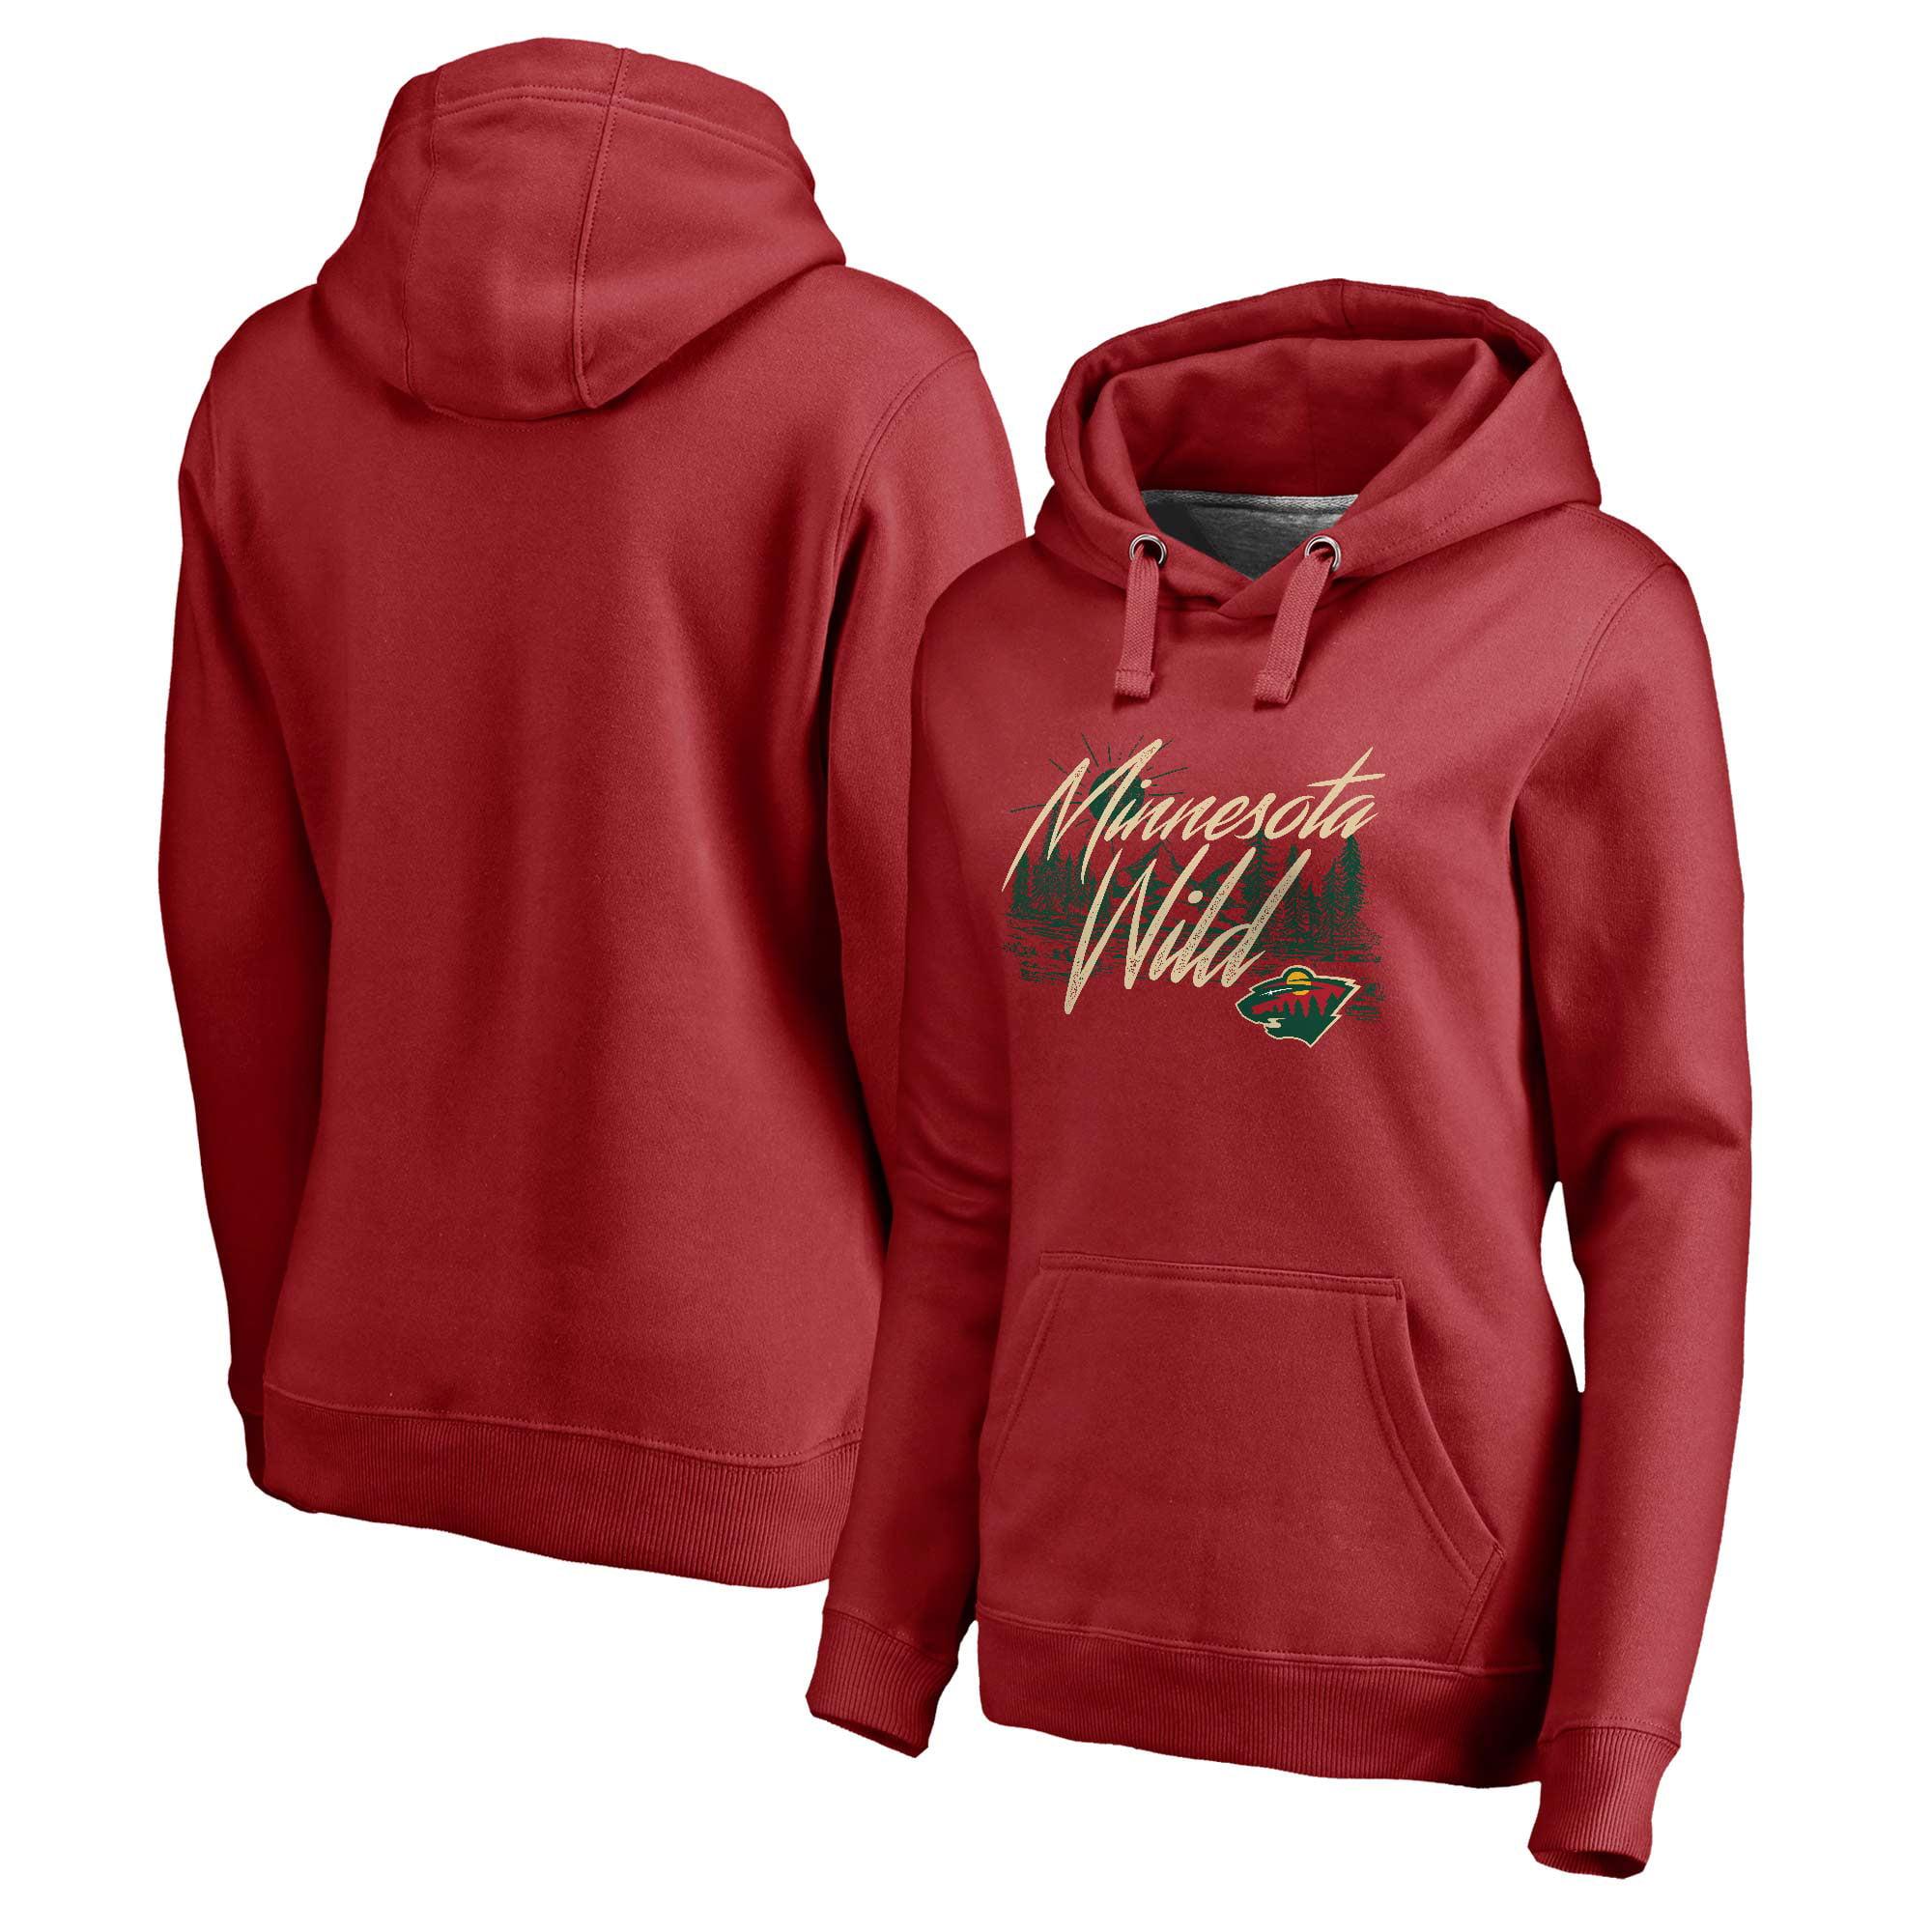 Women's Fanatics Branded Red Minnesota Wild Stay Wild Pullover Hoodie